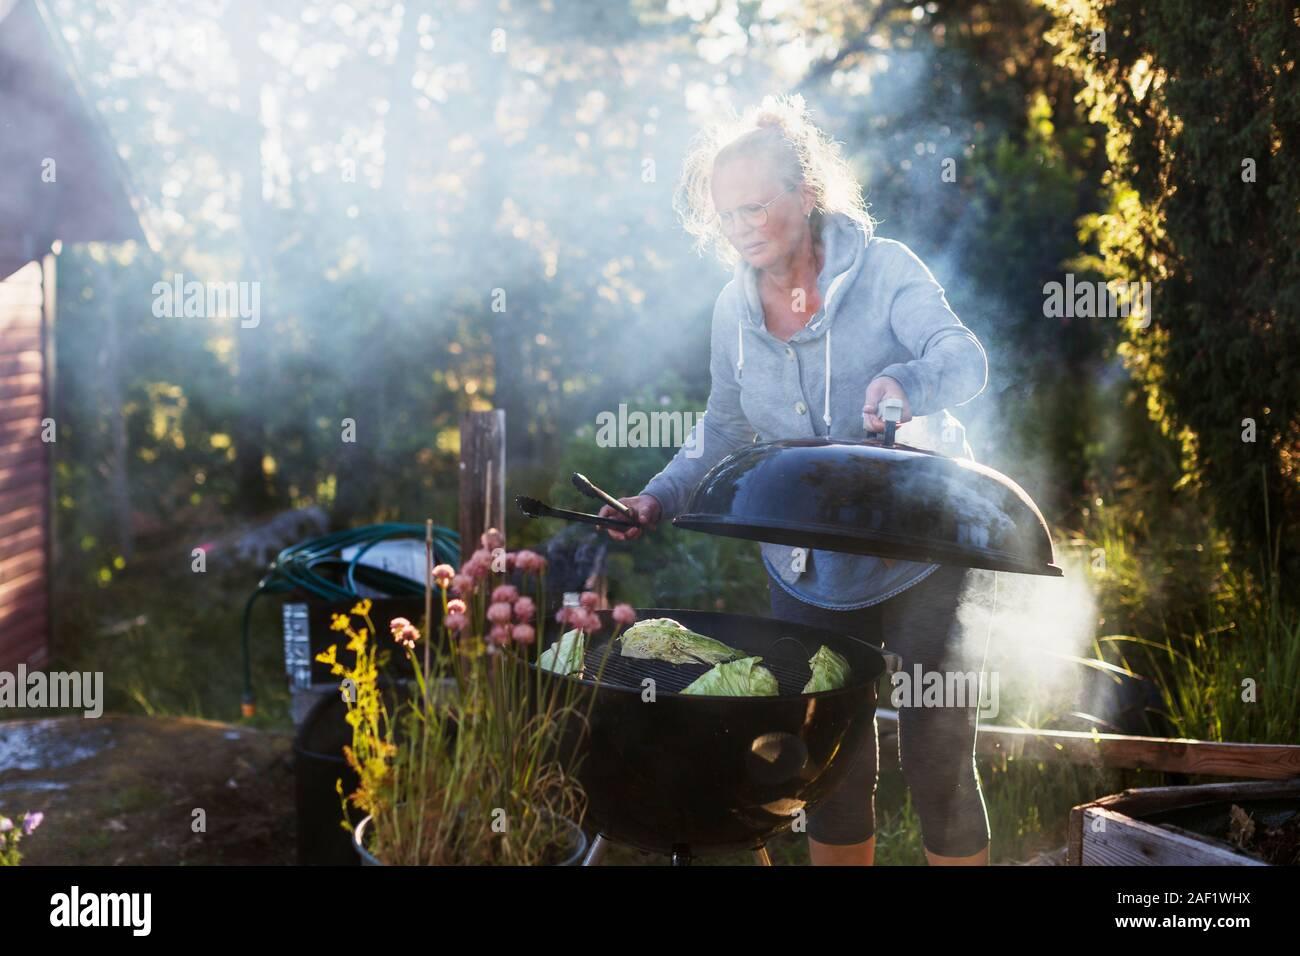 Woman having barbecue Stock Photo